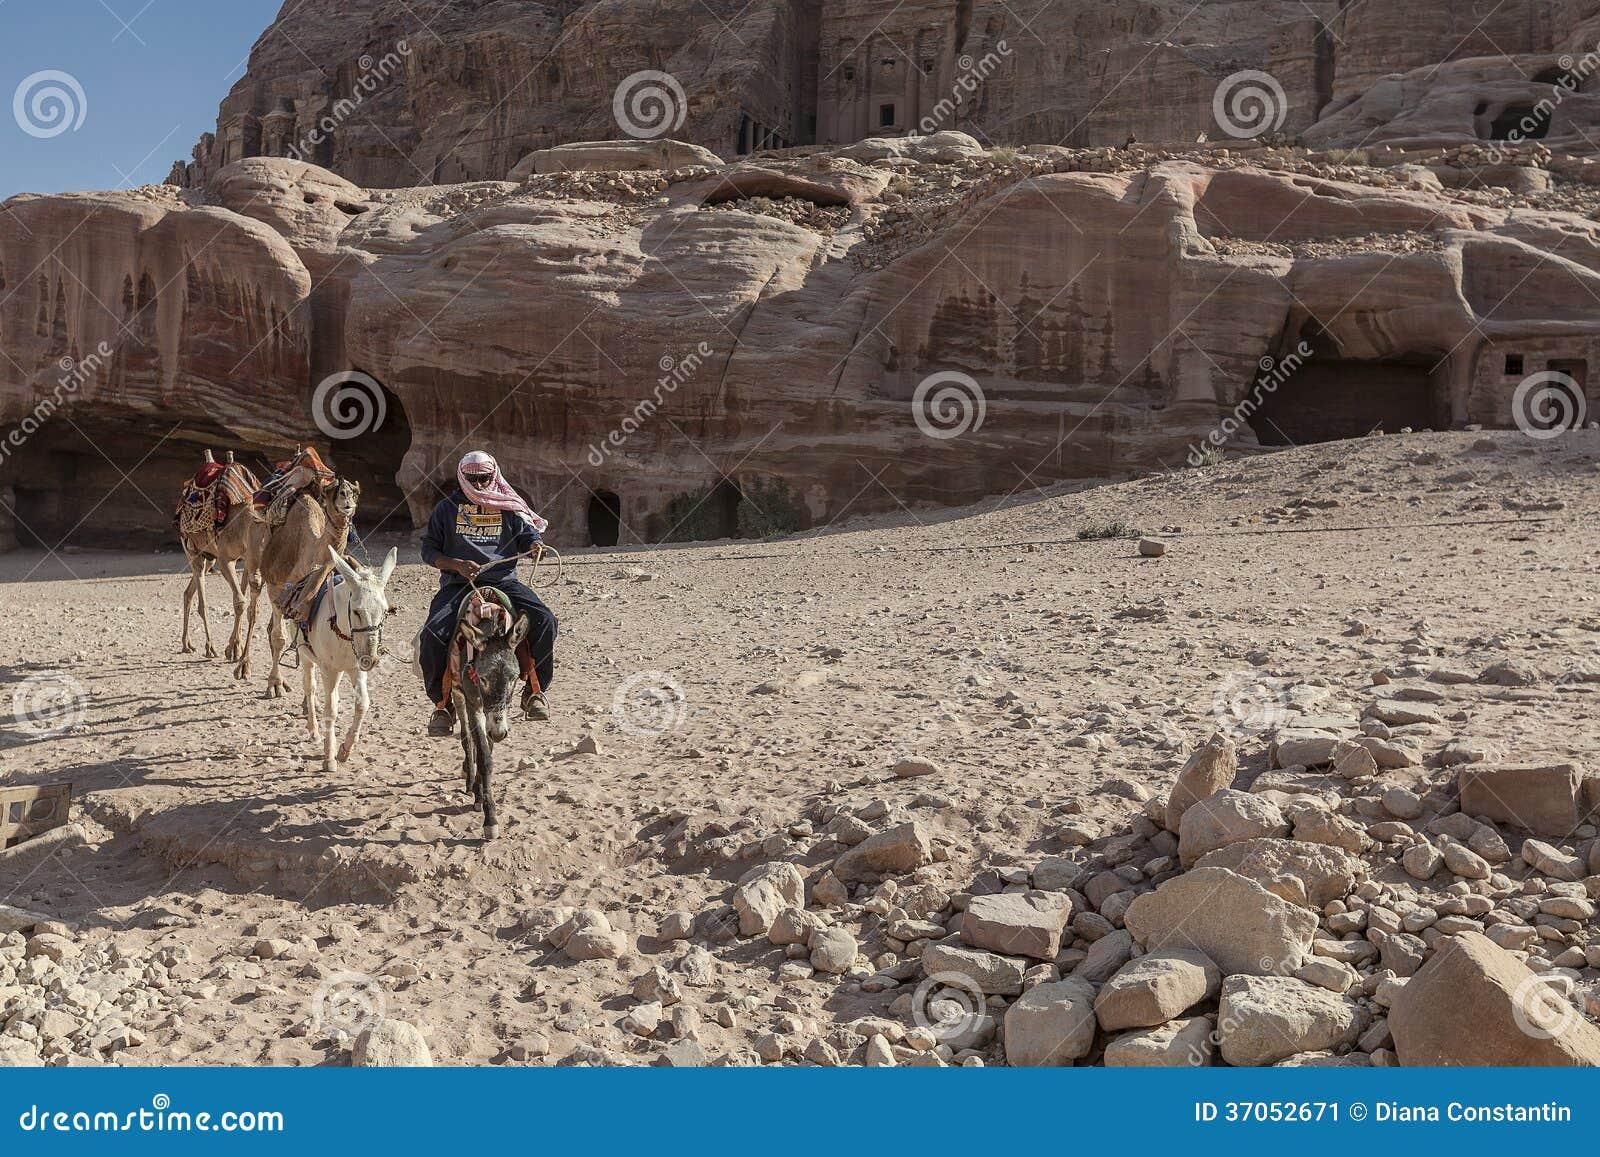 Bedouin riding a donkey